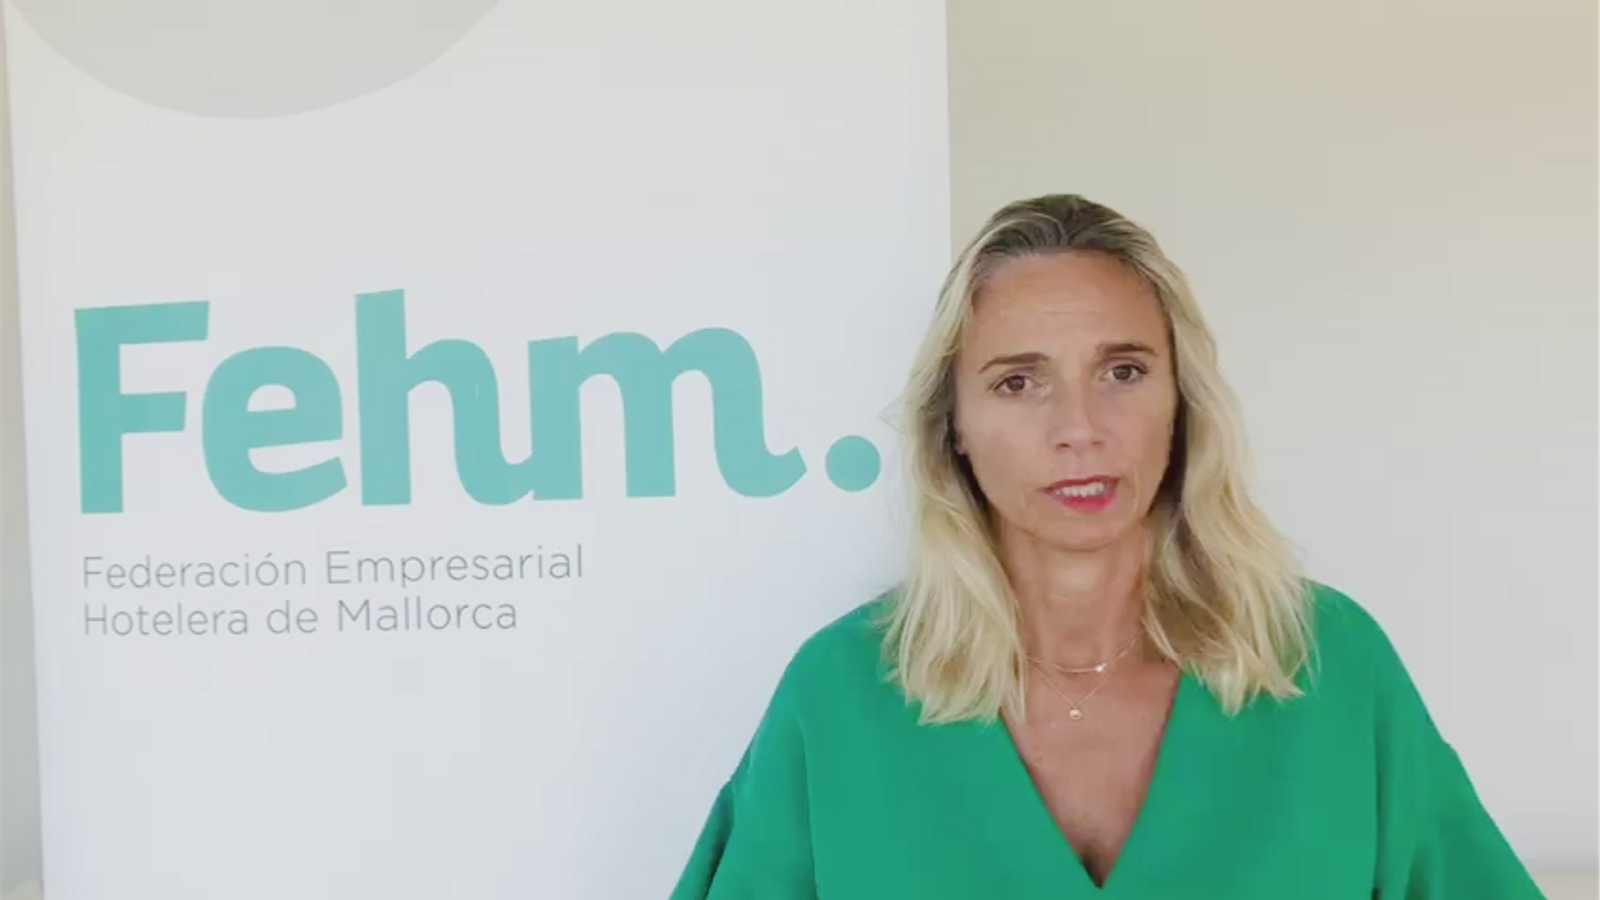 La presidenta de la Federació Empresarial Hotelera de Mallorca, Maria Frontera